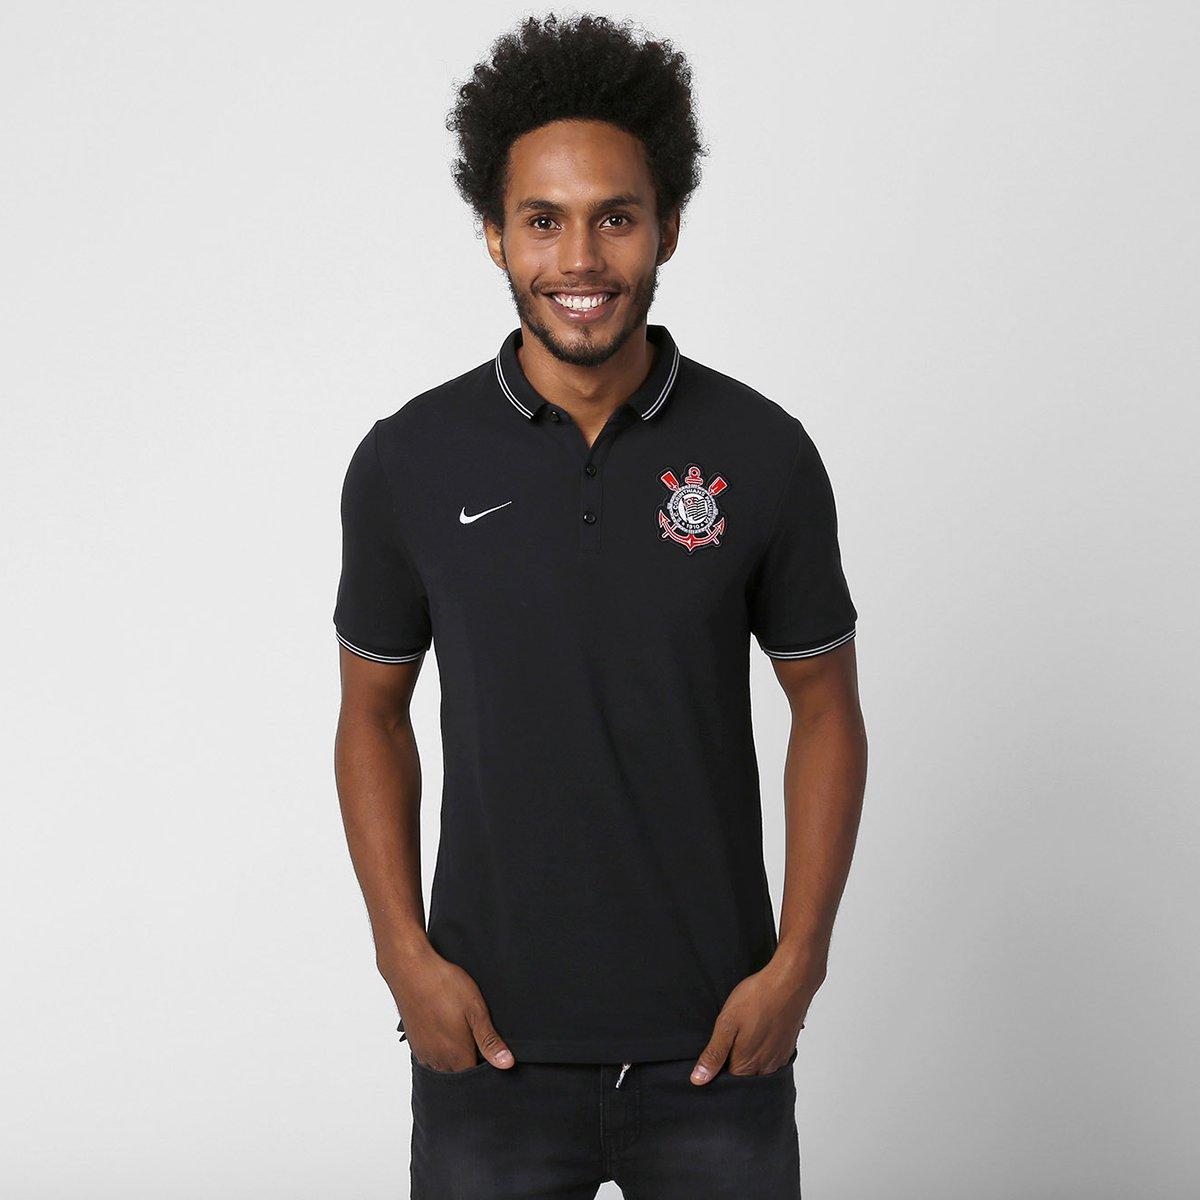 Camisa Polo Nike Corinthians League Authentic - Compre Agora  c176672736a4f